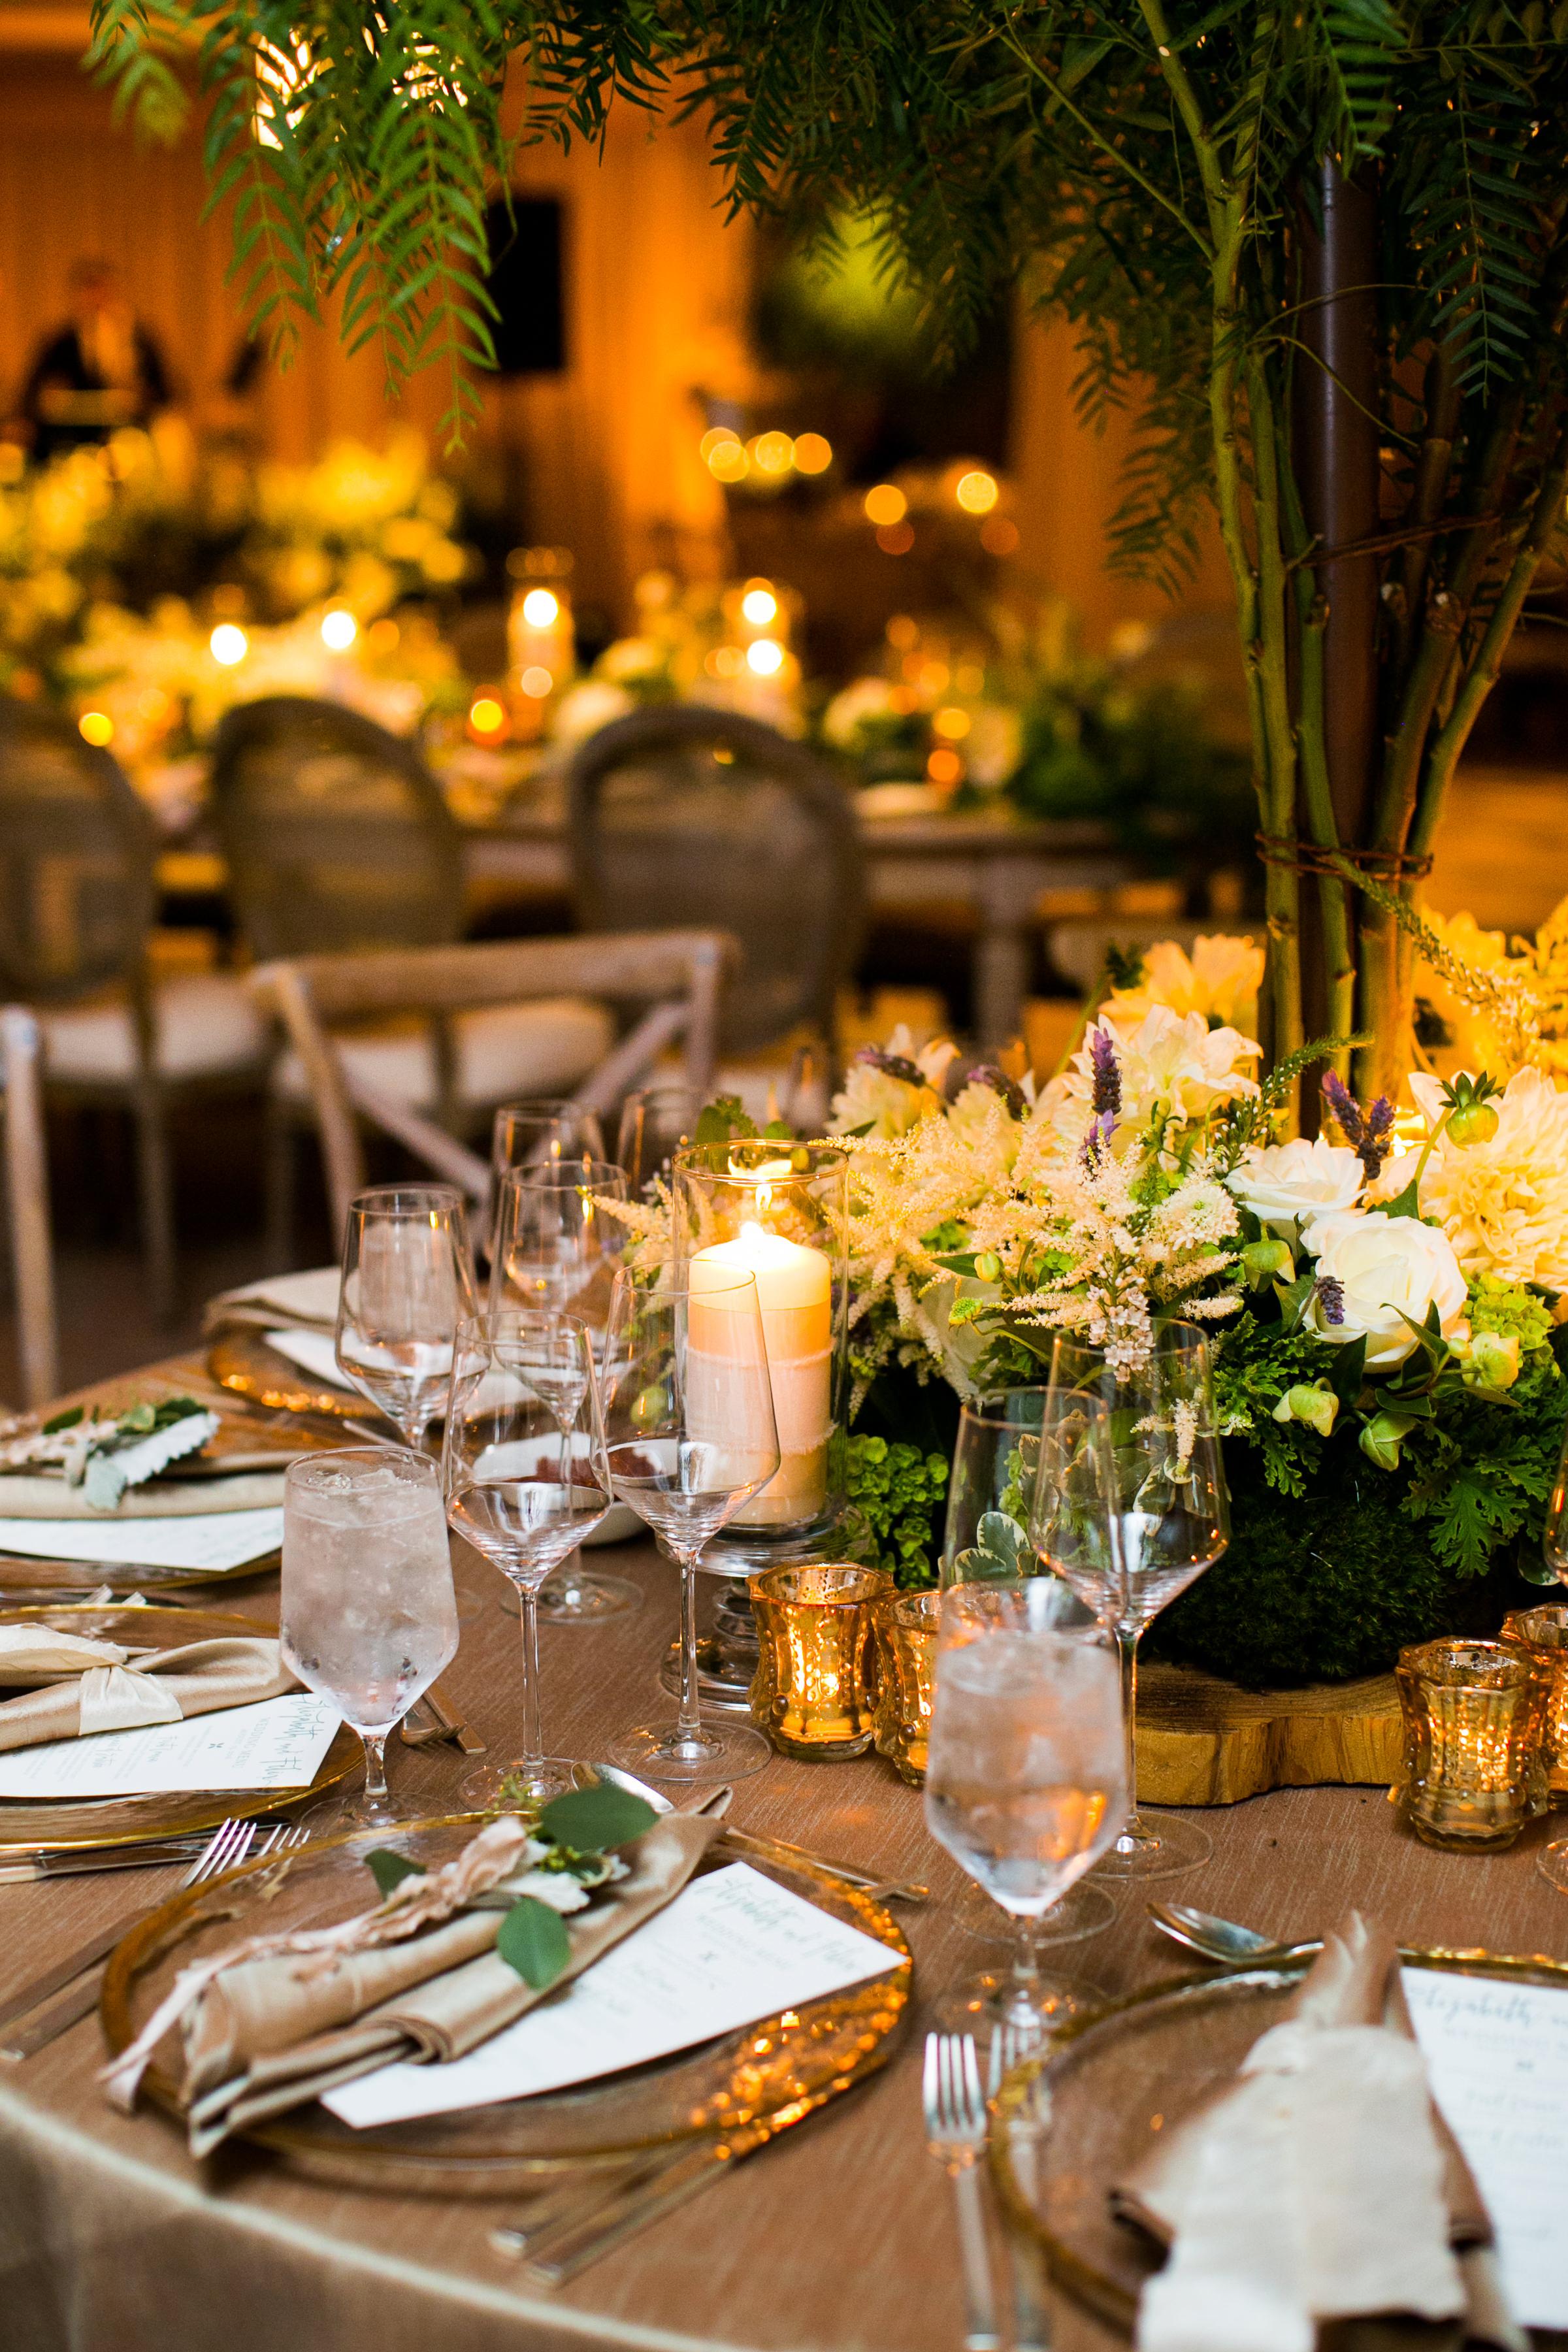 www.santabarbarawedding.com   Four Seasons Santa Barbara   Levine Fox Events   Callaway Gable Photo   Reception Table